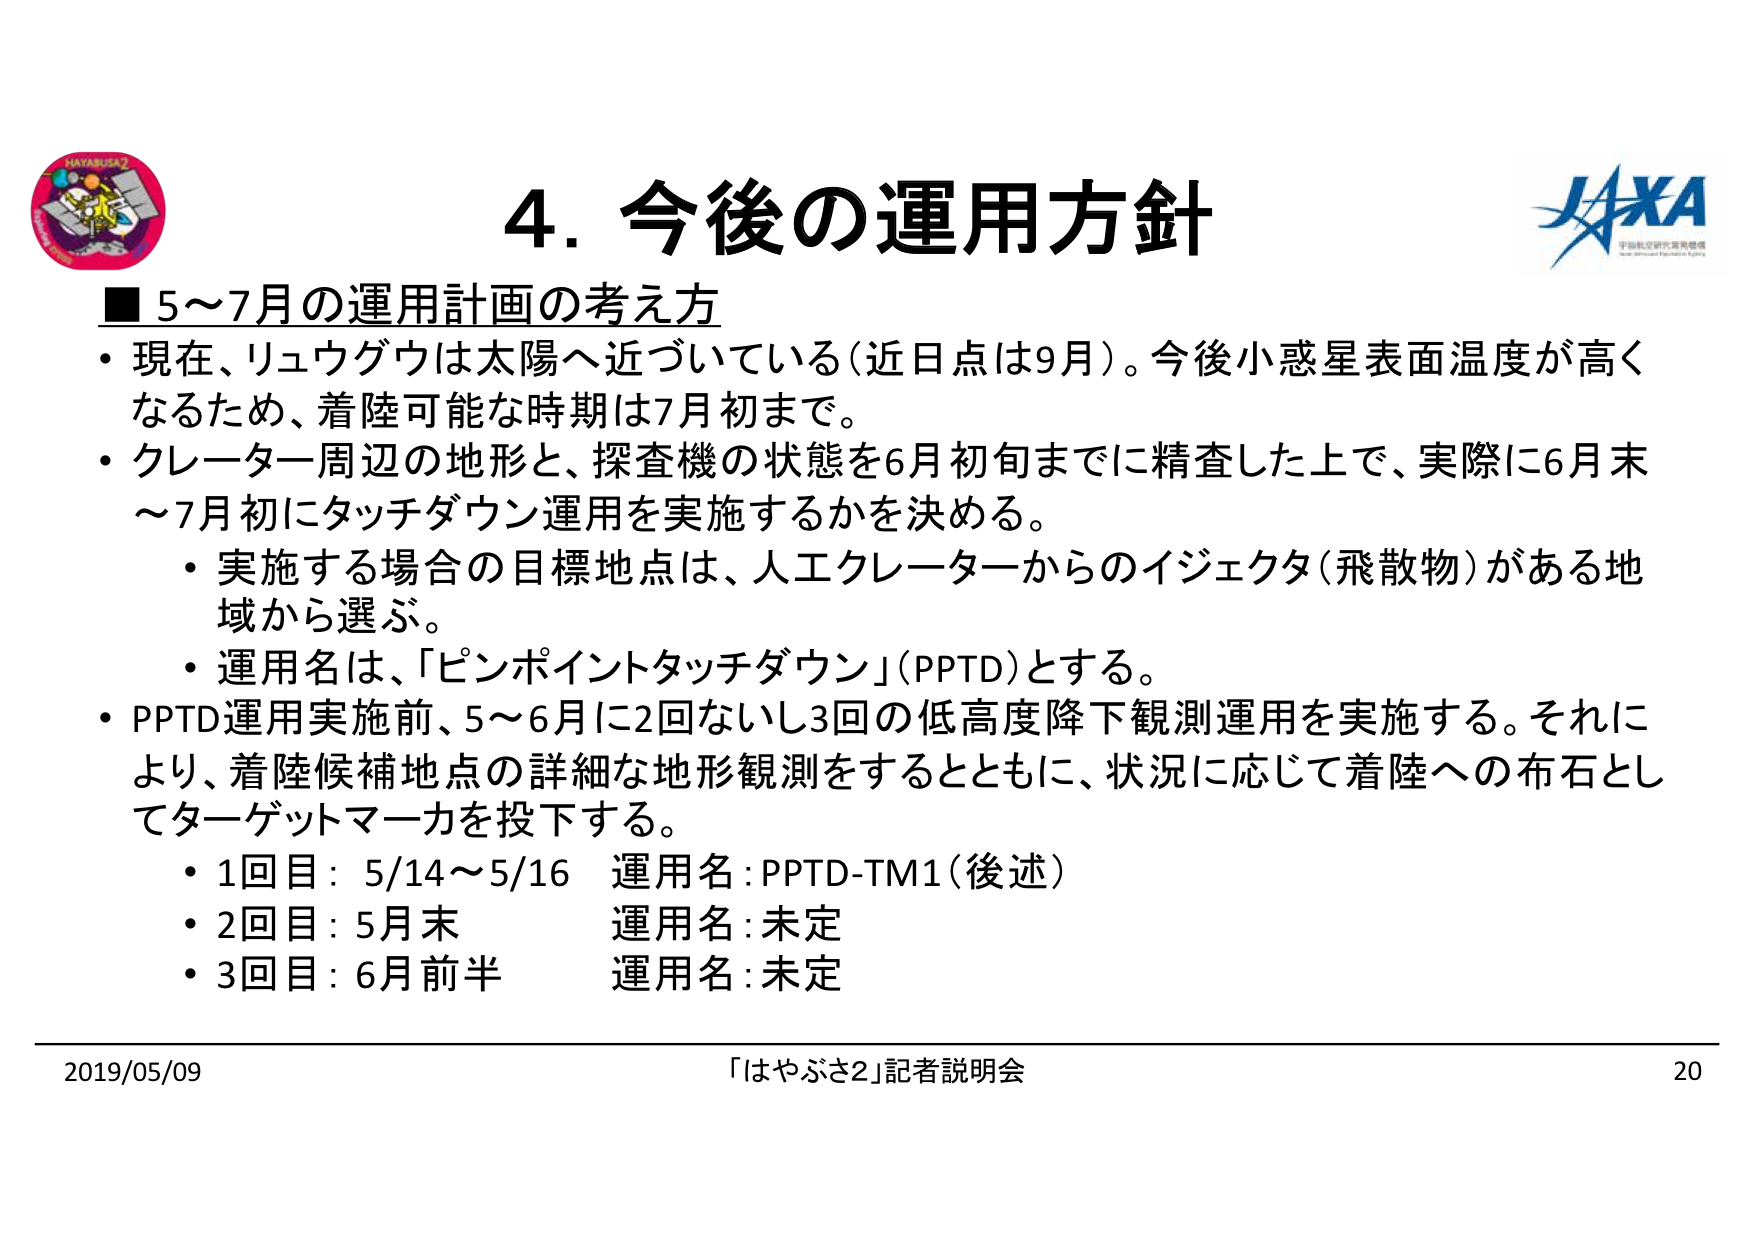 f:id:Imamura:20190509154416p:plain